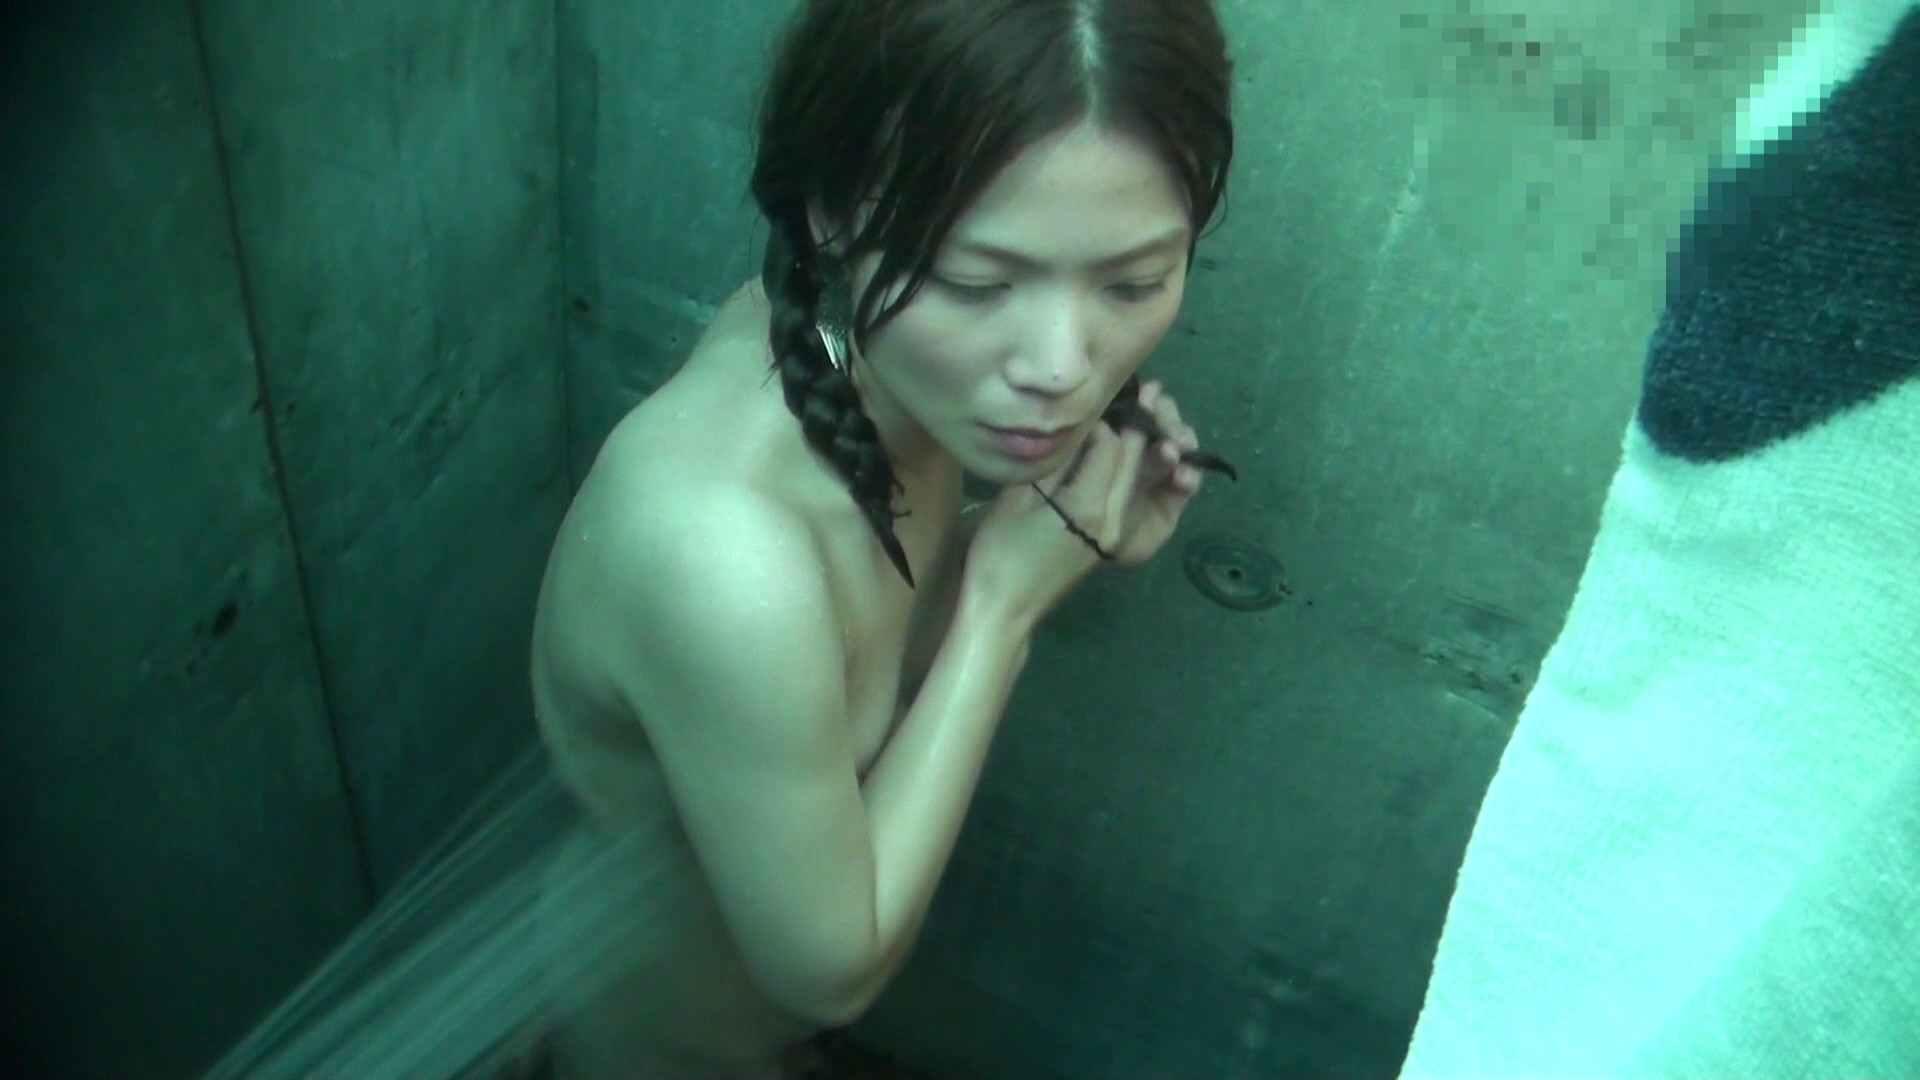 Vol.12 女性の性器には予想外の砂が混入しているようです。 OLのボディ   高画質  85PIX 49